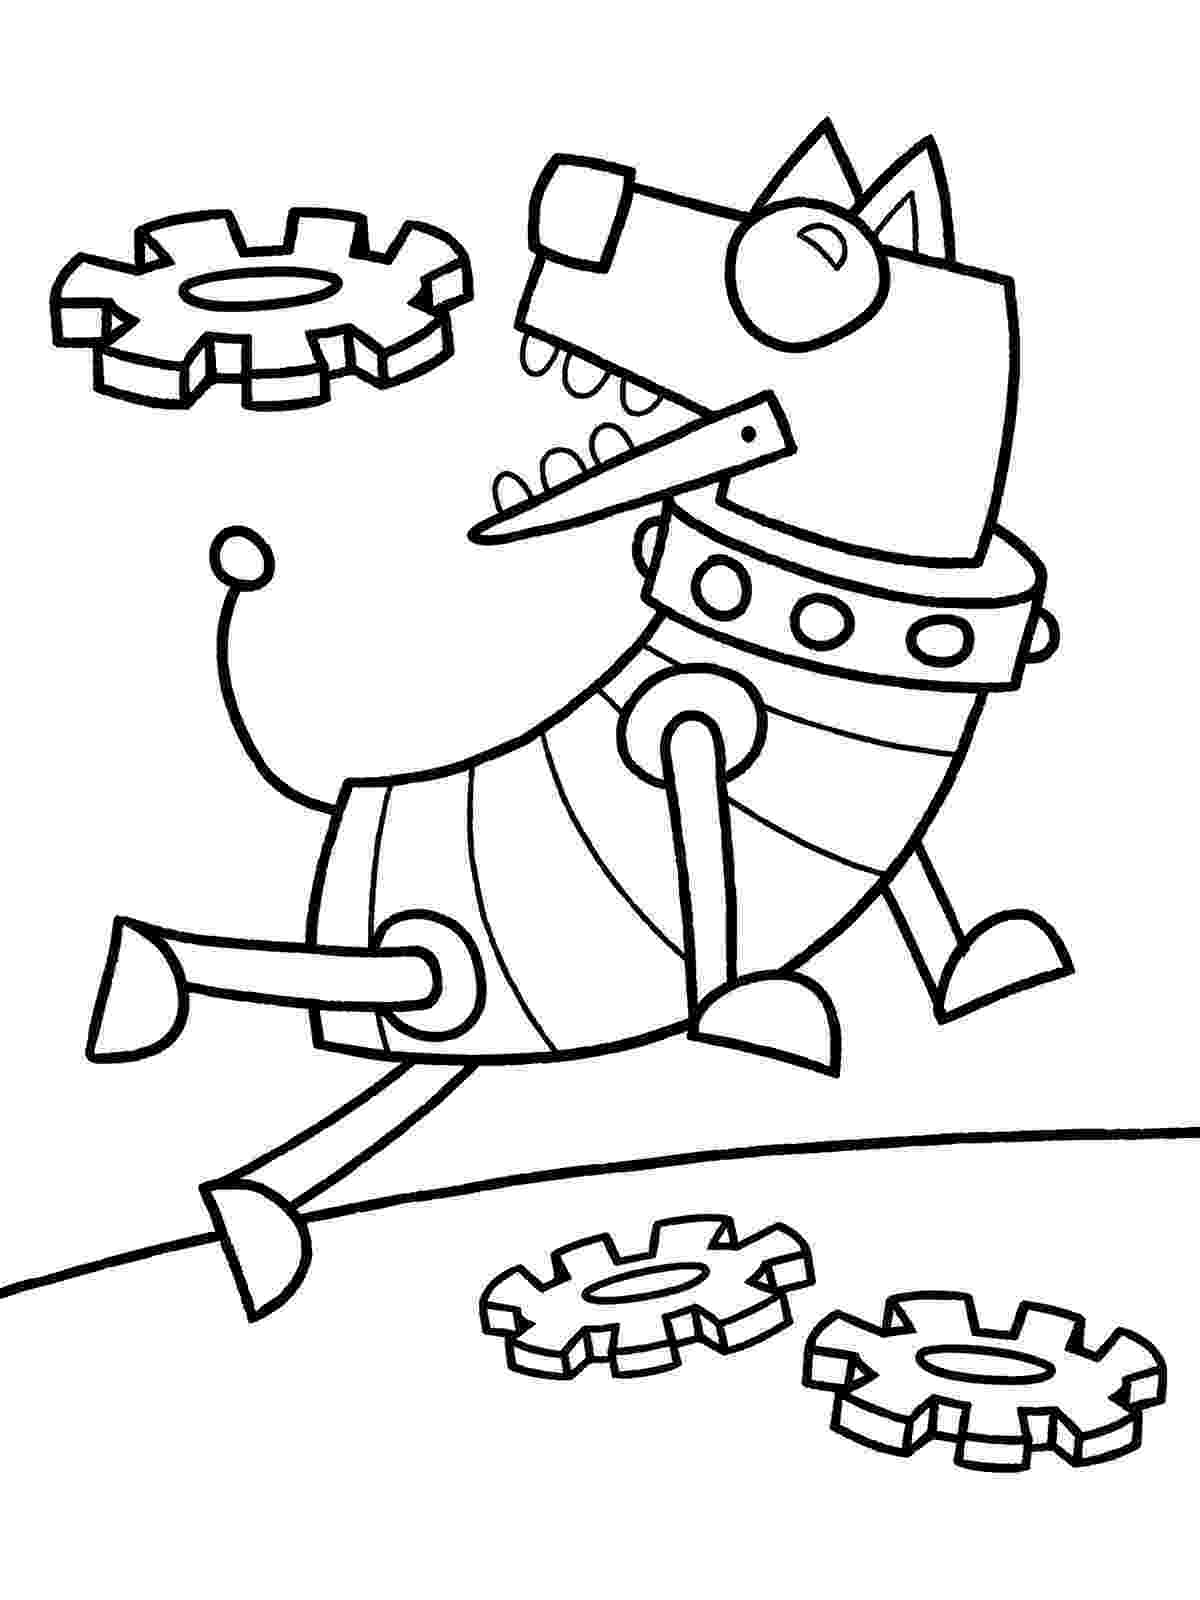 coloring page robot robot coloring page crayon action coloring pages page robot coloring